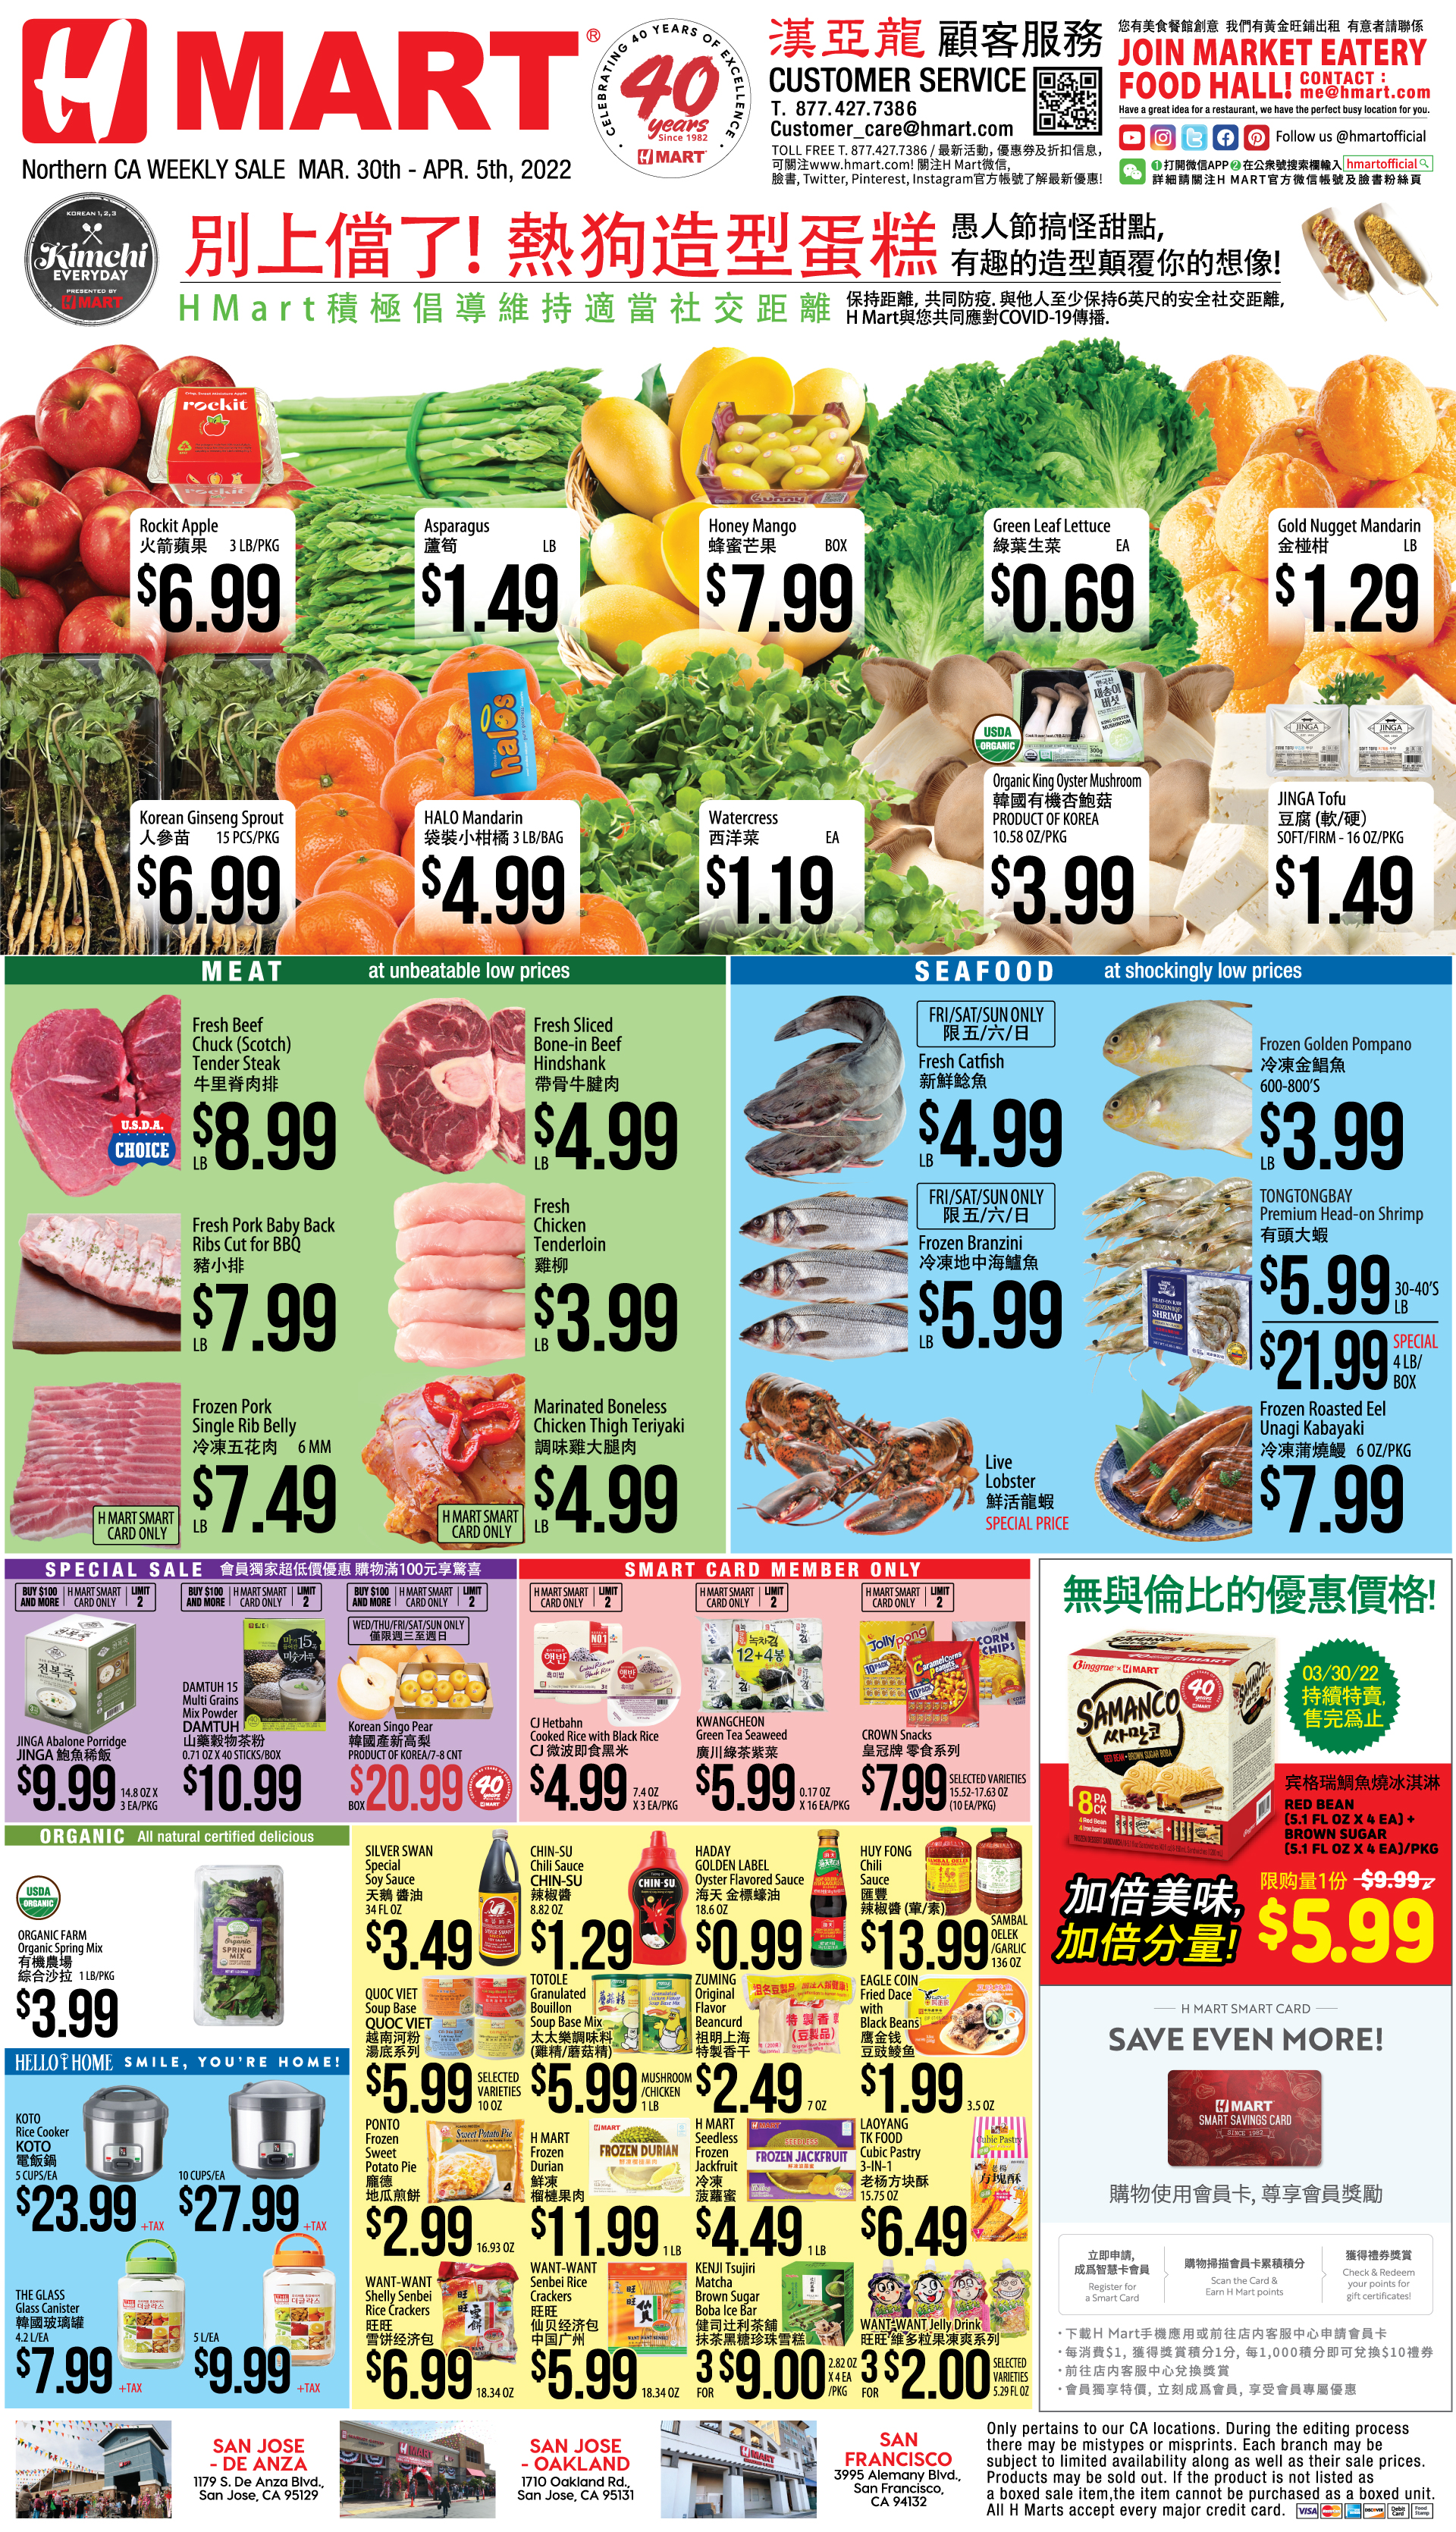 Weekly sales on Northern California